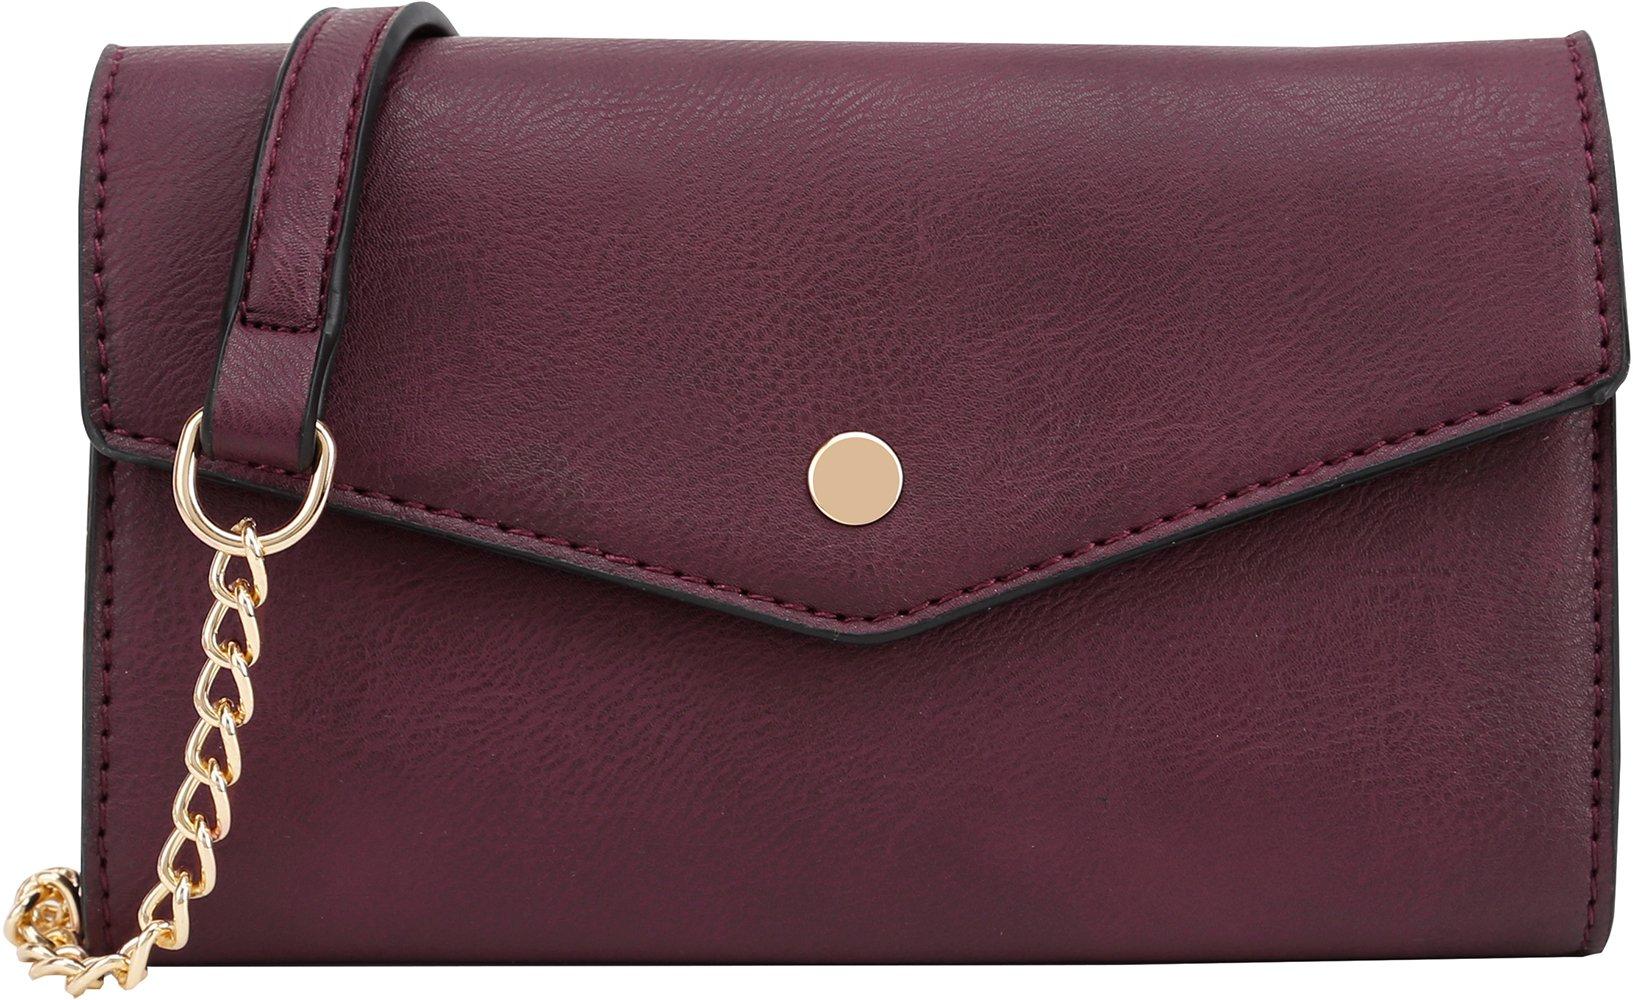 DELUXITY Women's Envelope Clutch Crossbody Wallet (Wine)